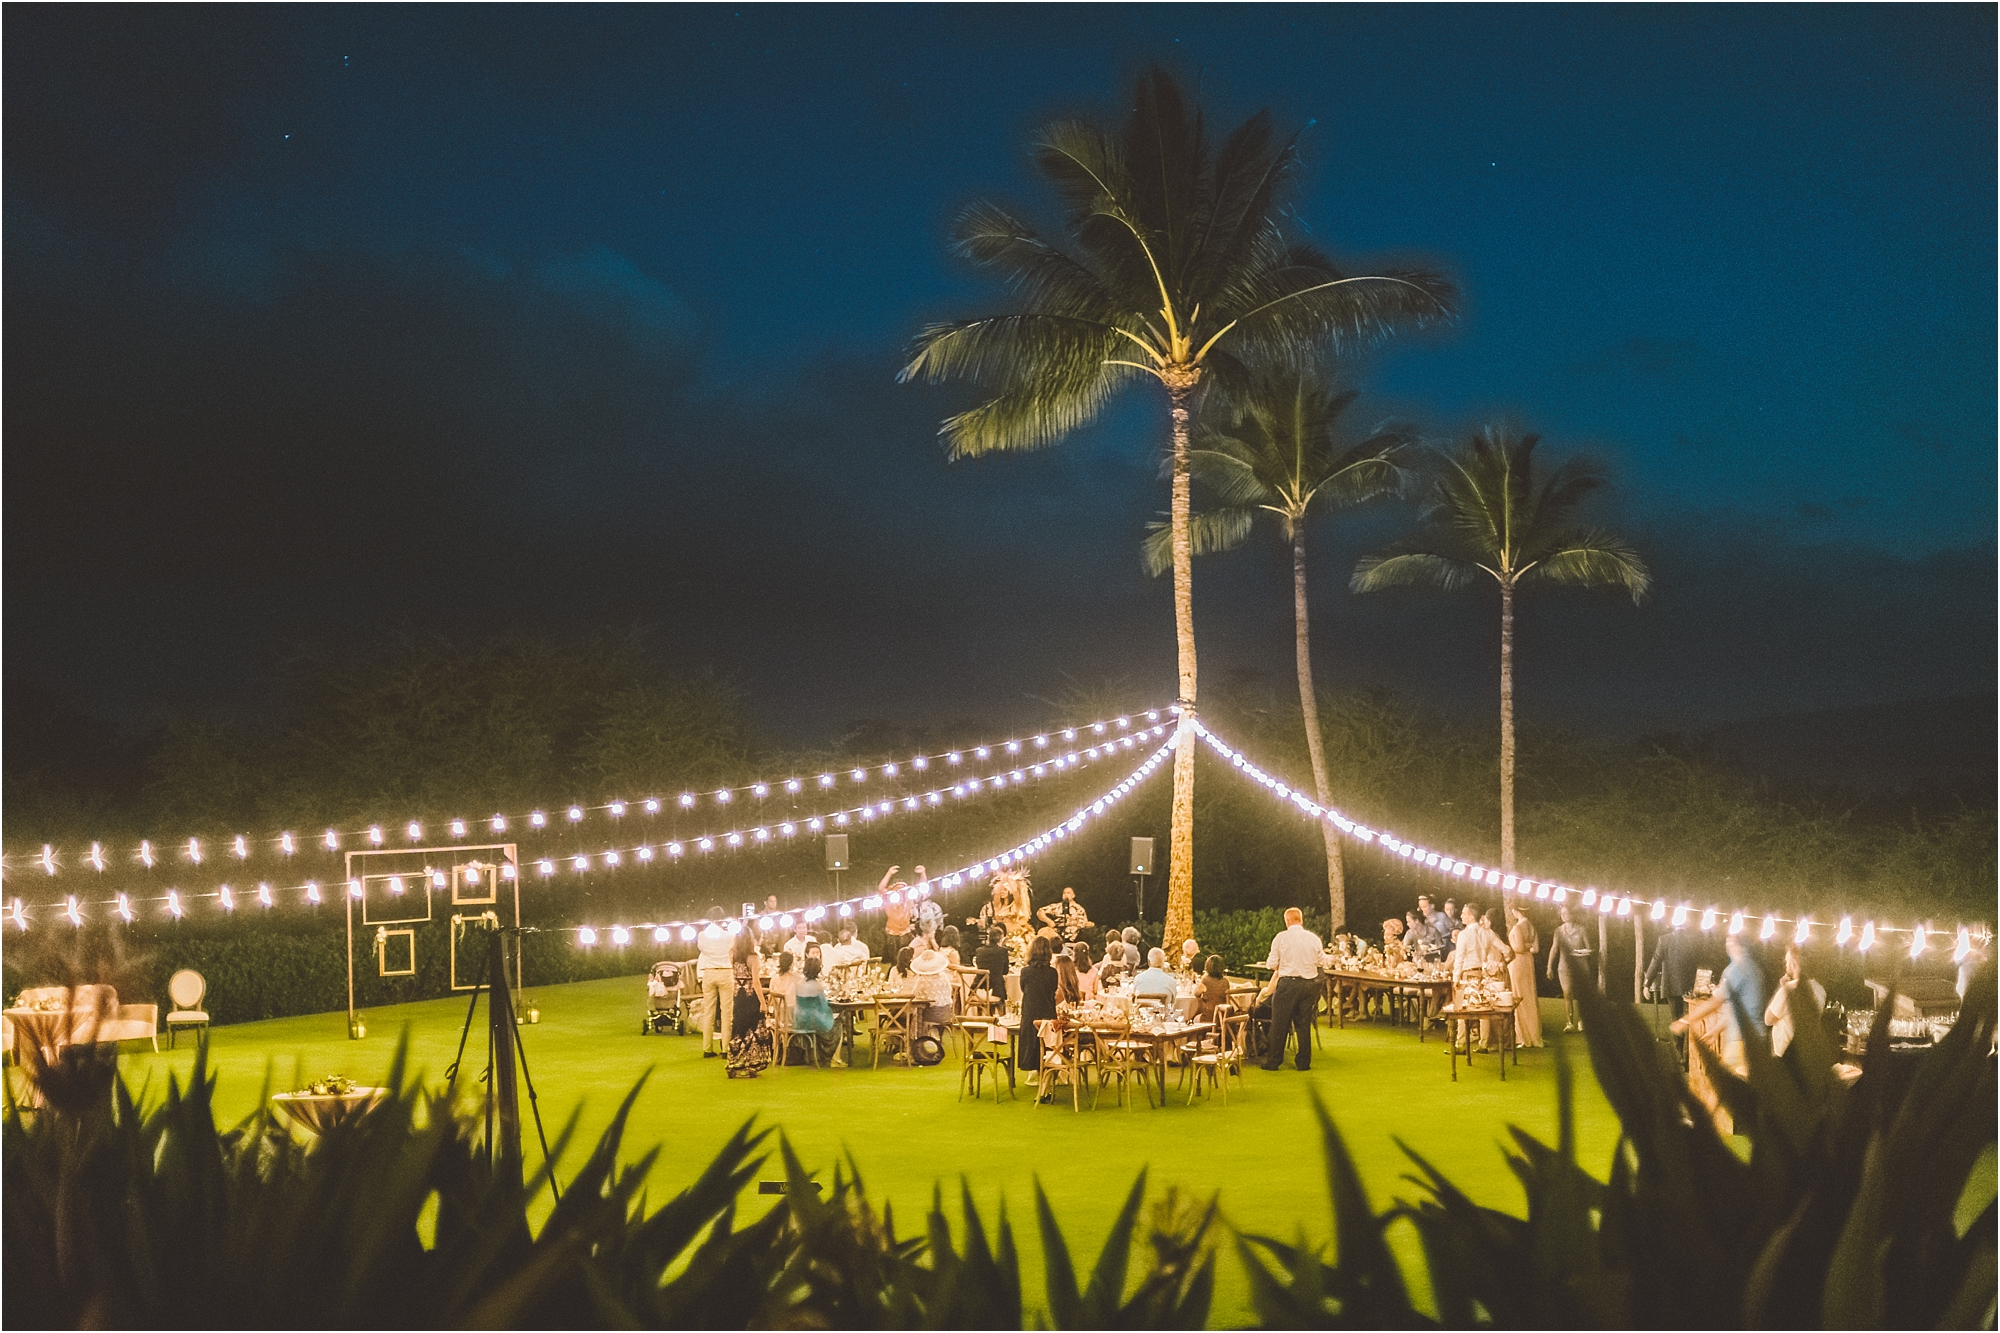 angie-diaz-photography-maui-hawaii-destination-wedding-makena-golf-beach-club_0077.jpg